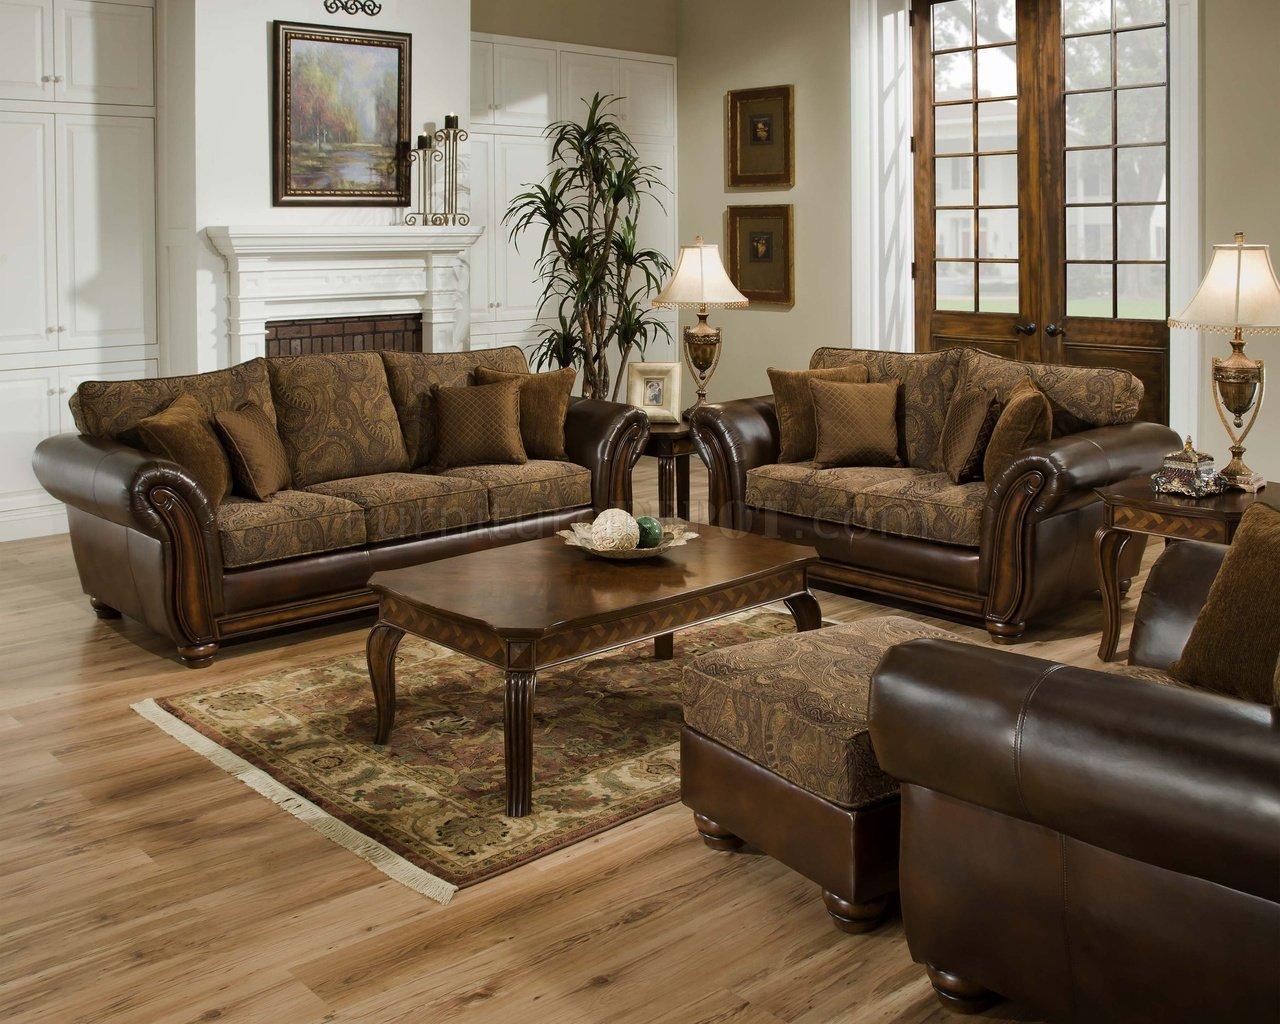 sofa and loveseat sets vintage chenille sofa u0026 loveseat set w/brown bonded leather base OSWIATL